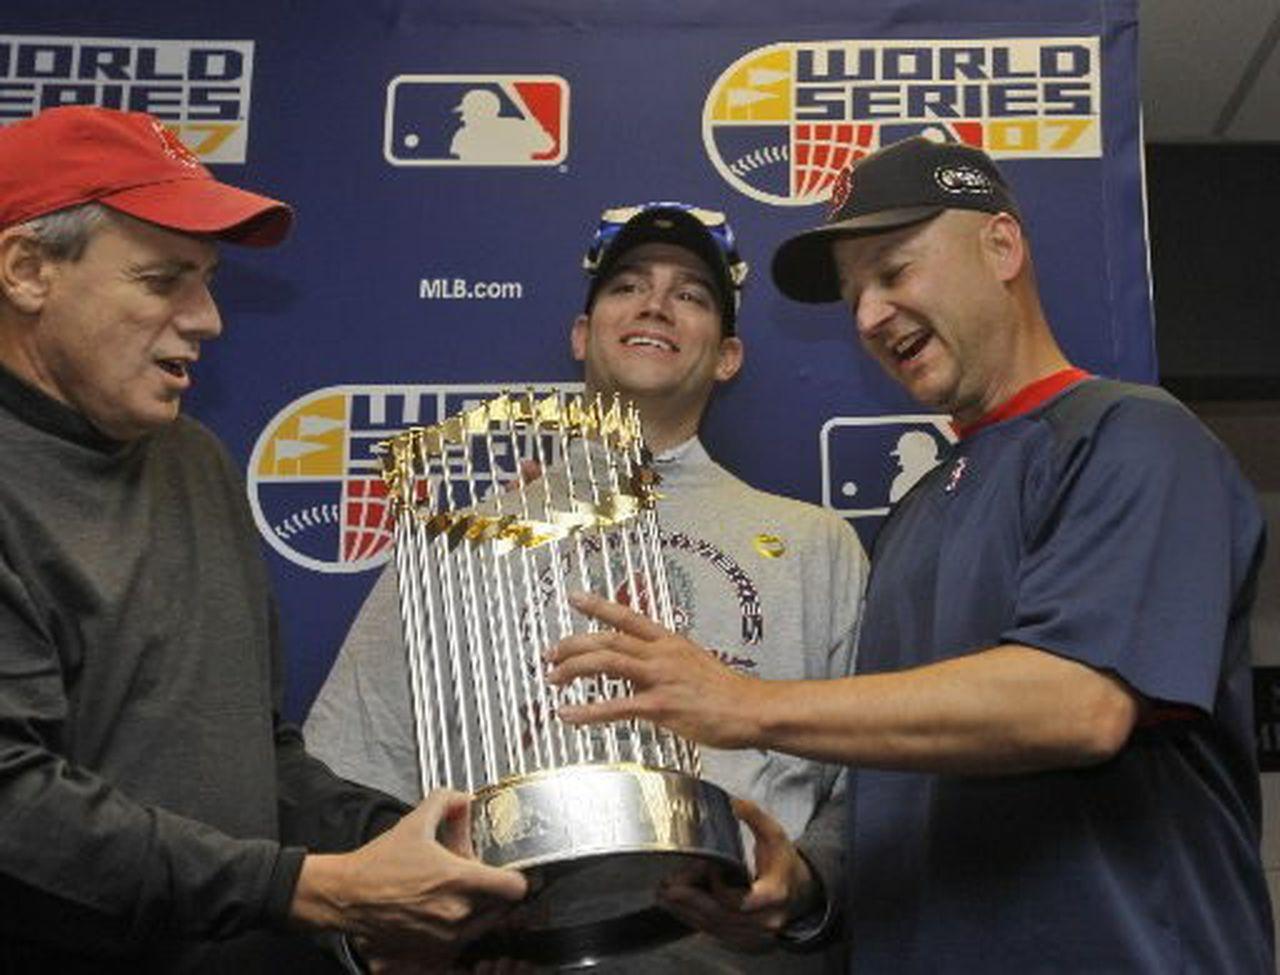 Terry Francona stolen World Series rings